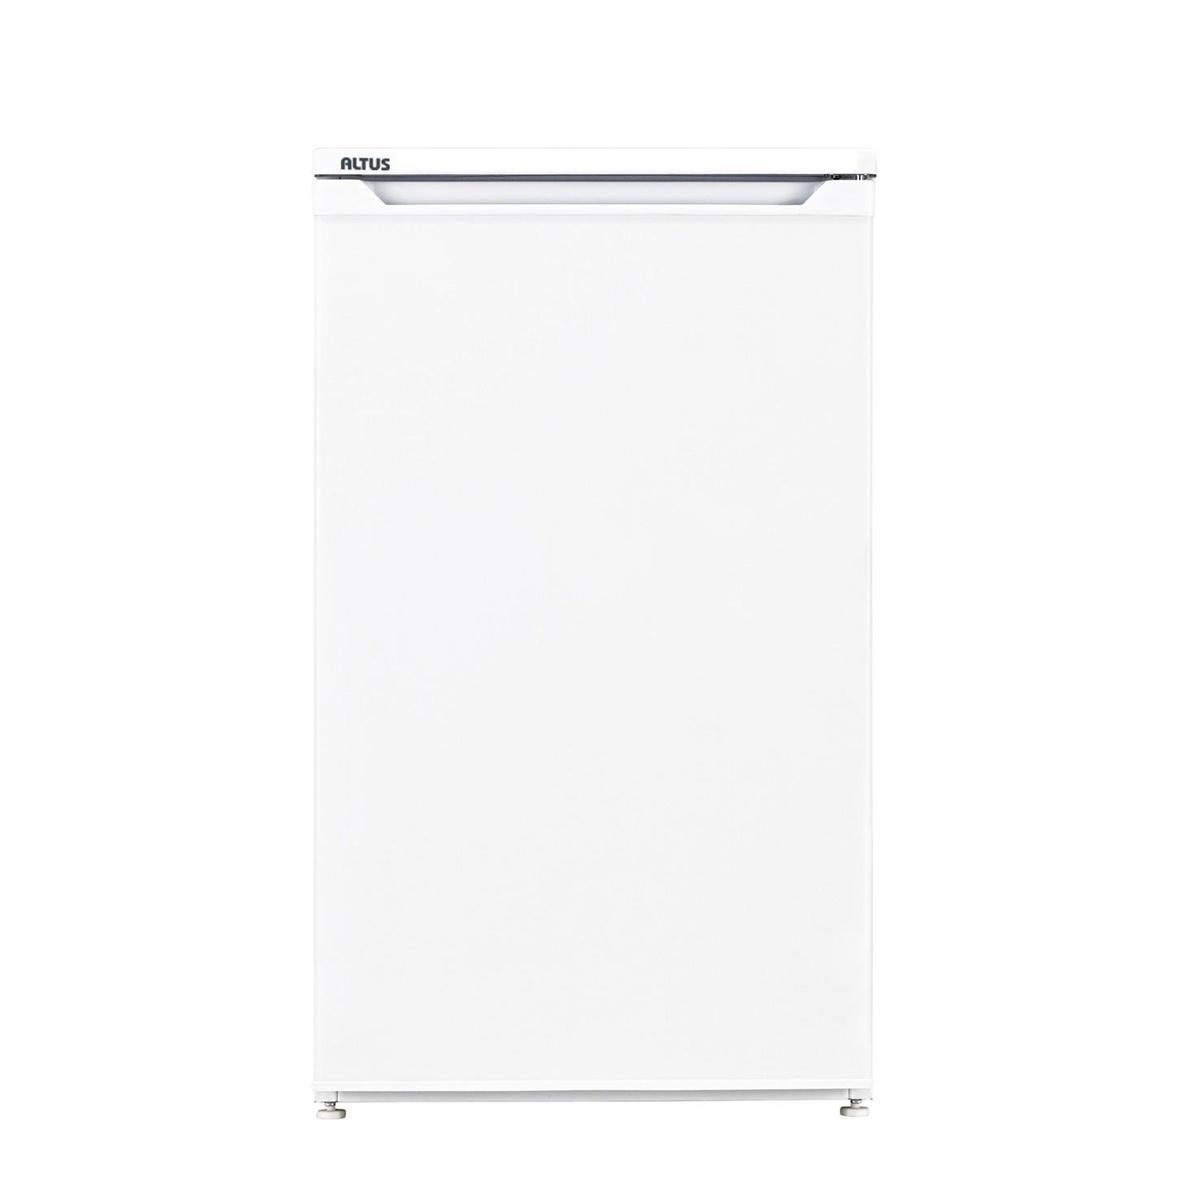 Standart Altus AL 306 E A+ Büro Tipi Mini Buzdolabı